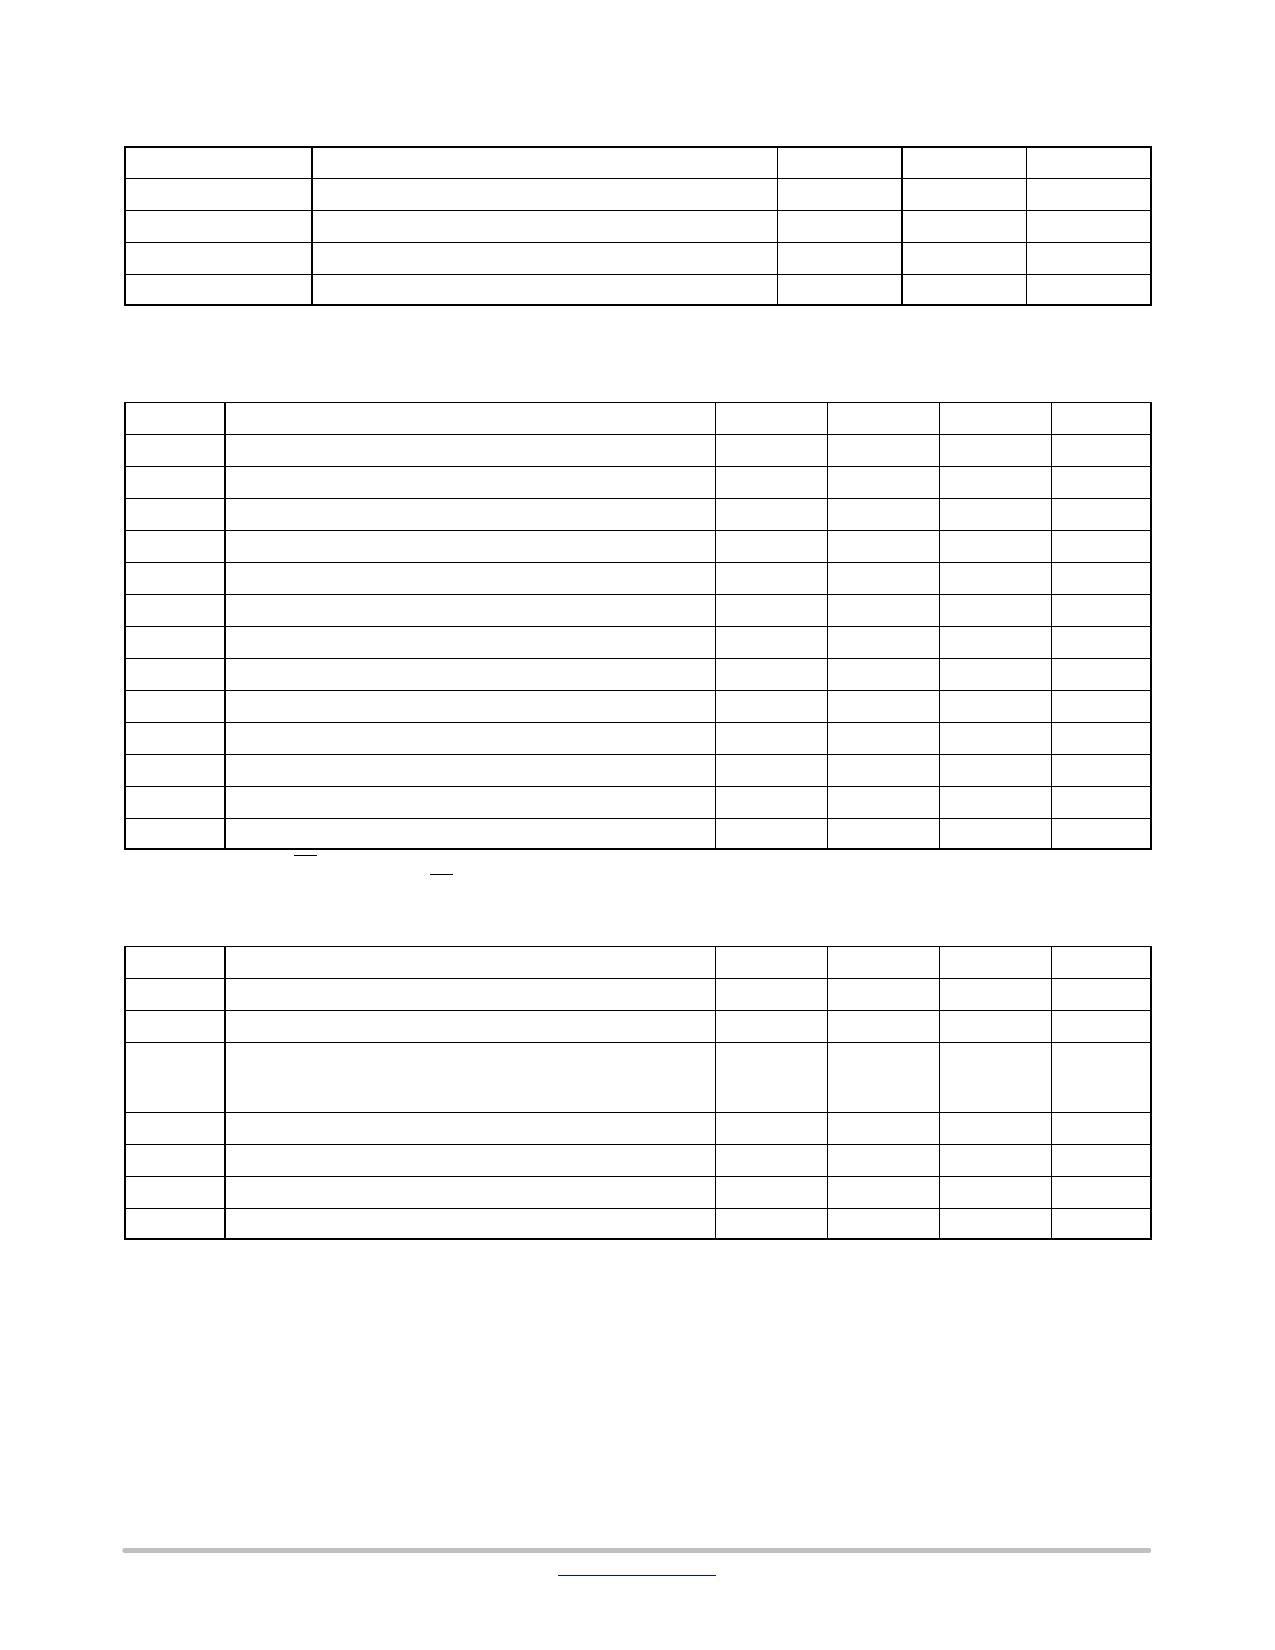 ASM3P2760A pdf, 電子部品, 半導体, ピン配列